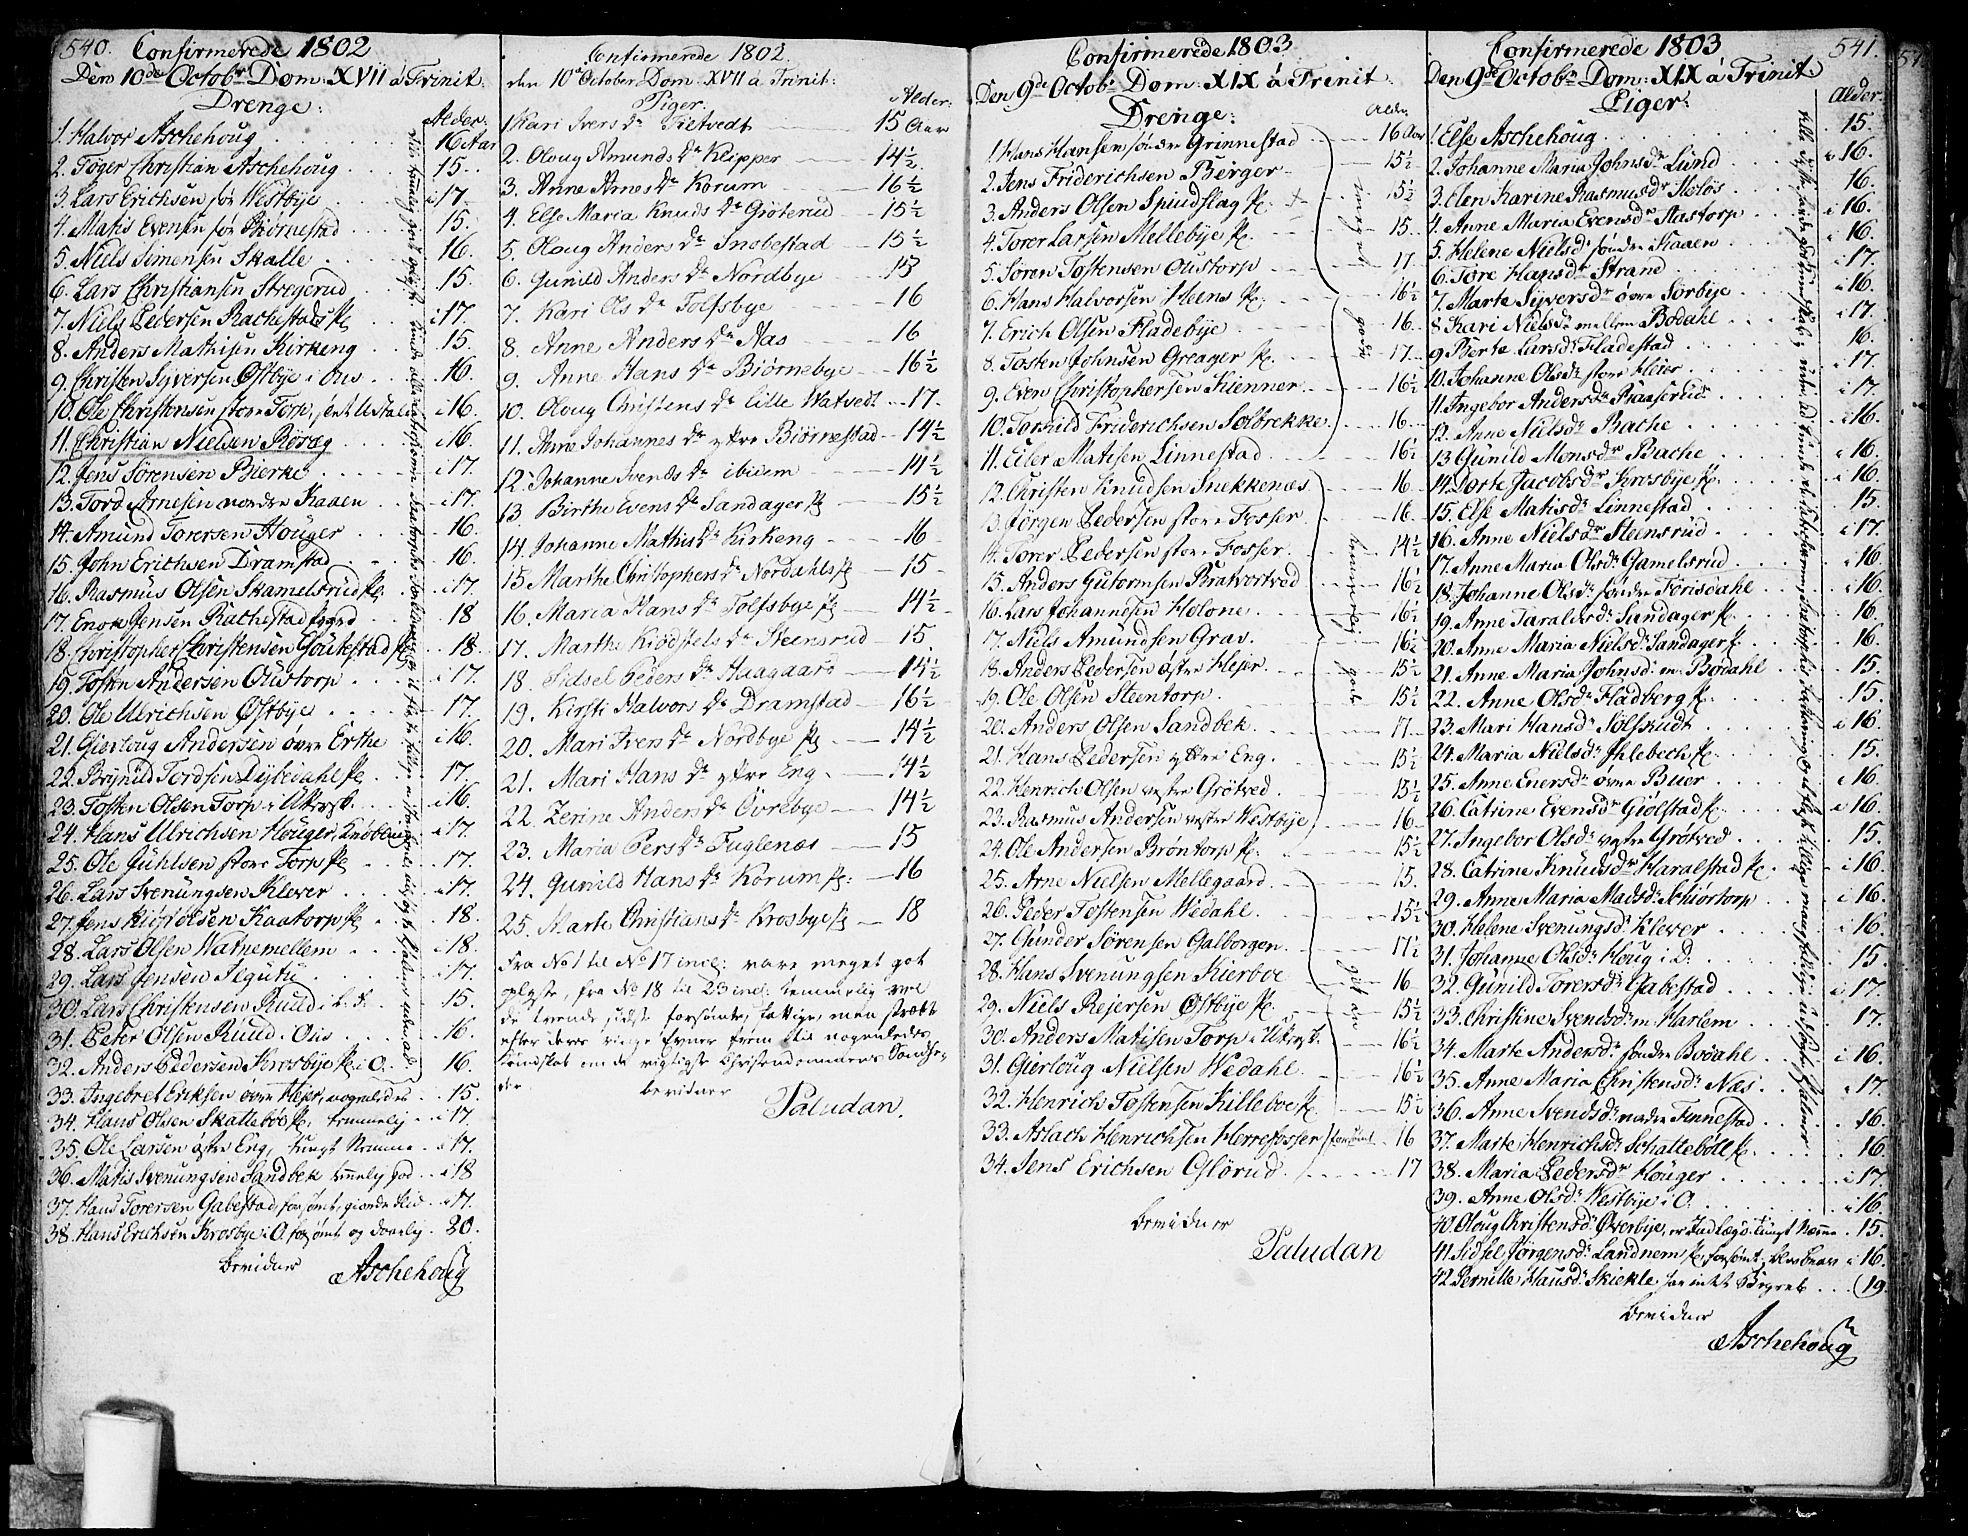 SAO, Rakkestad prestekontor Kirkebøker, F/Fa/L0005: Ministerialbok nr. I 5, 1784-1814, s. 540-541